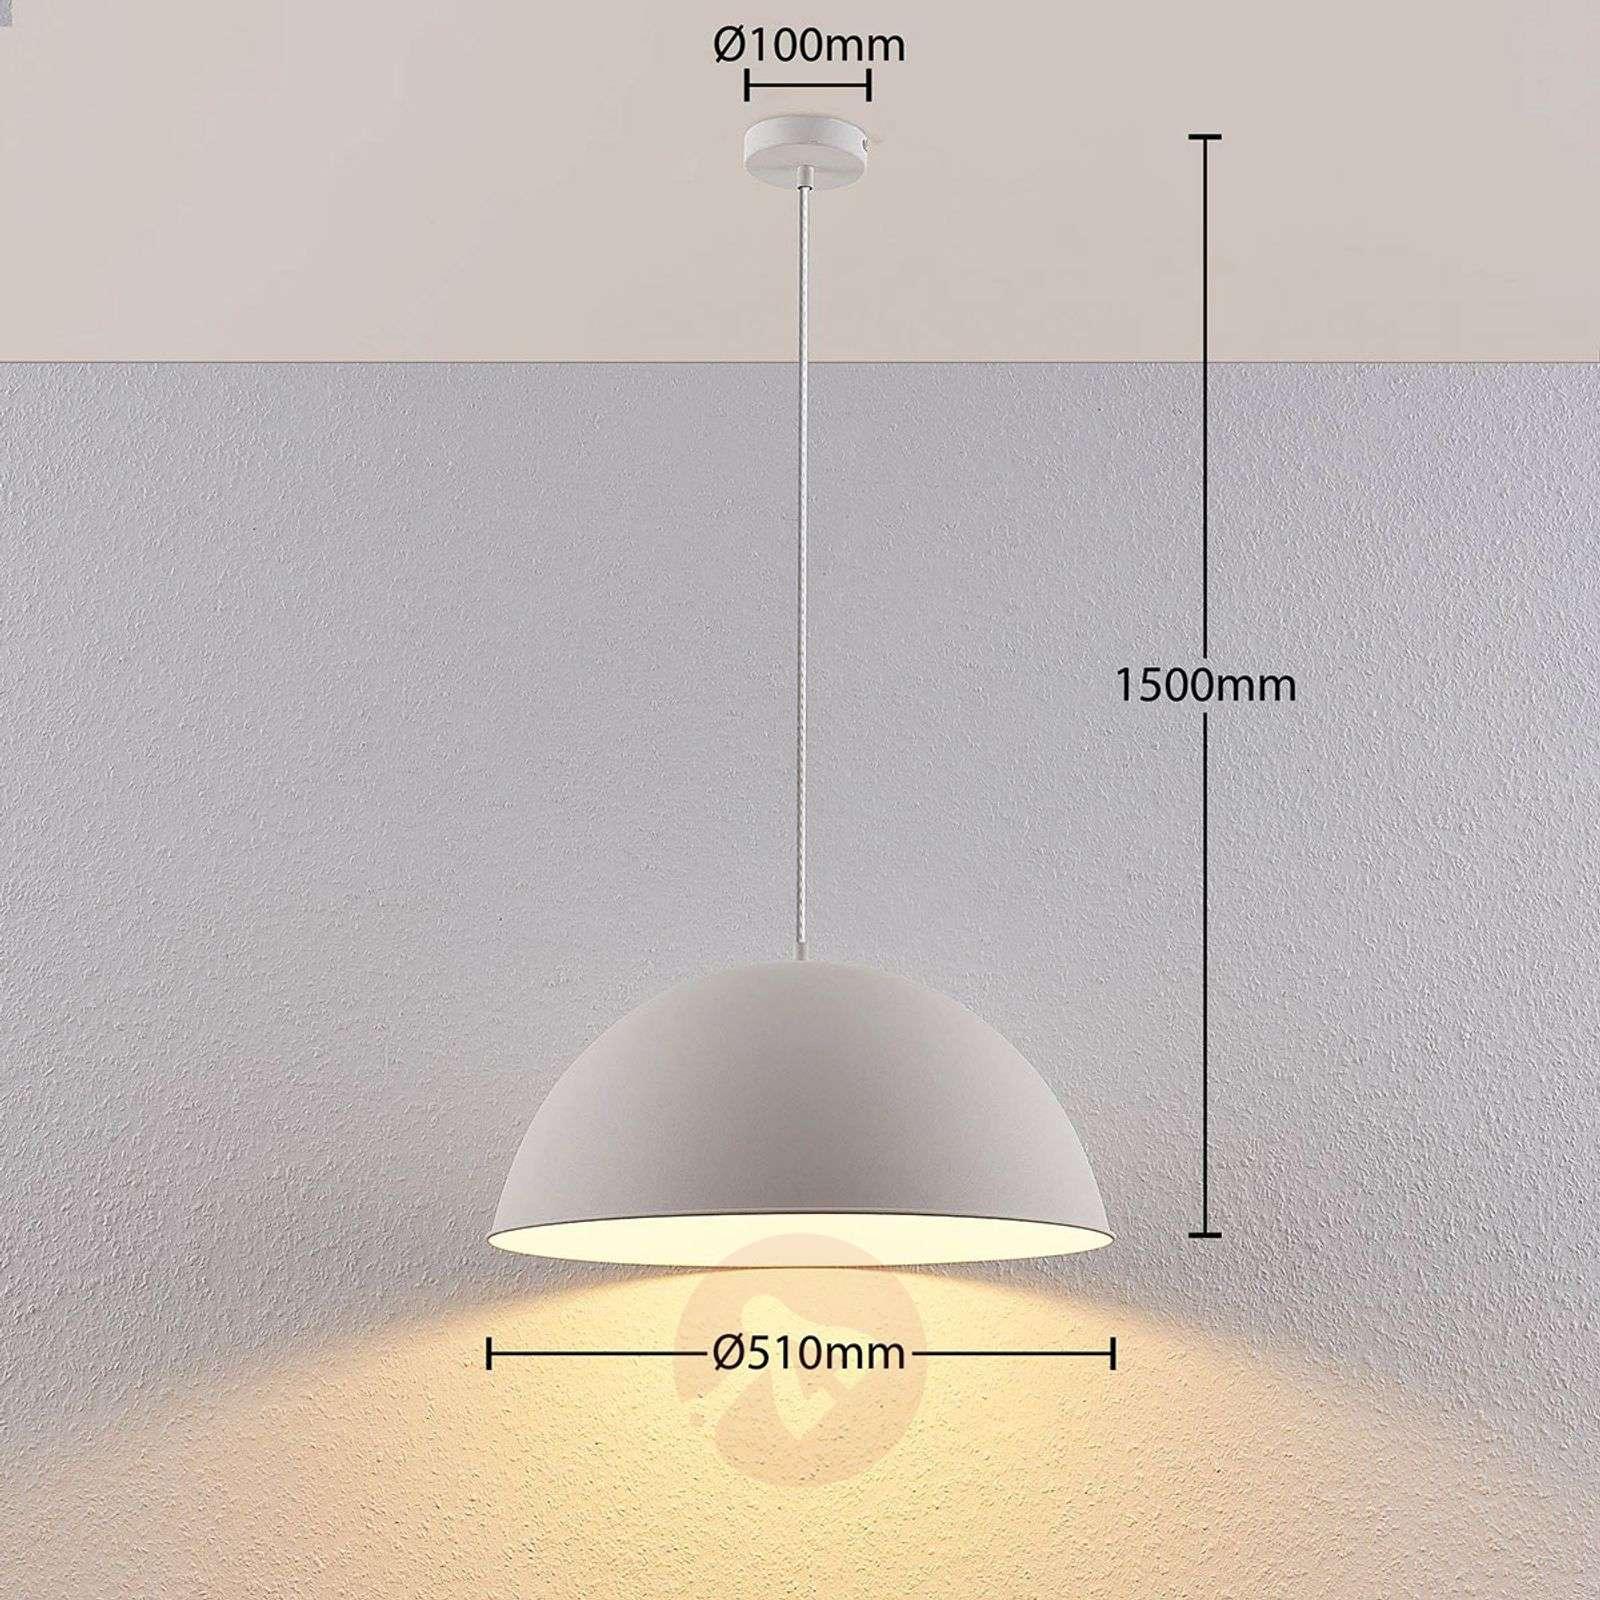 Lindby Smart LED-riippuvalaisin Bowl 51 cm valk.-9624248-02